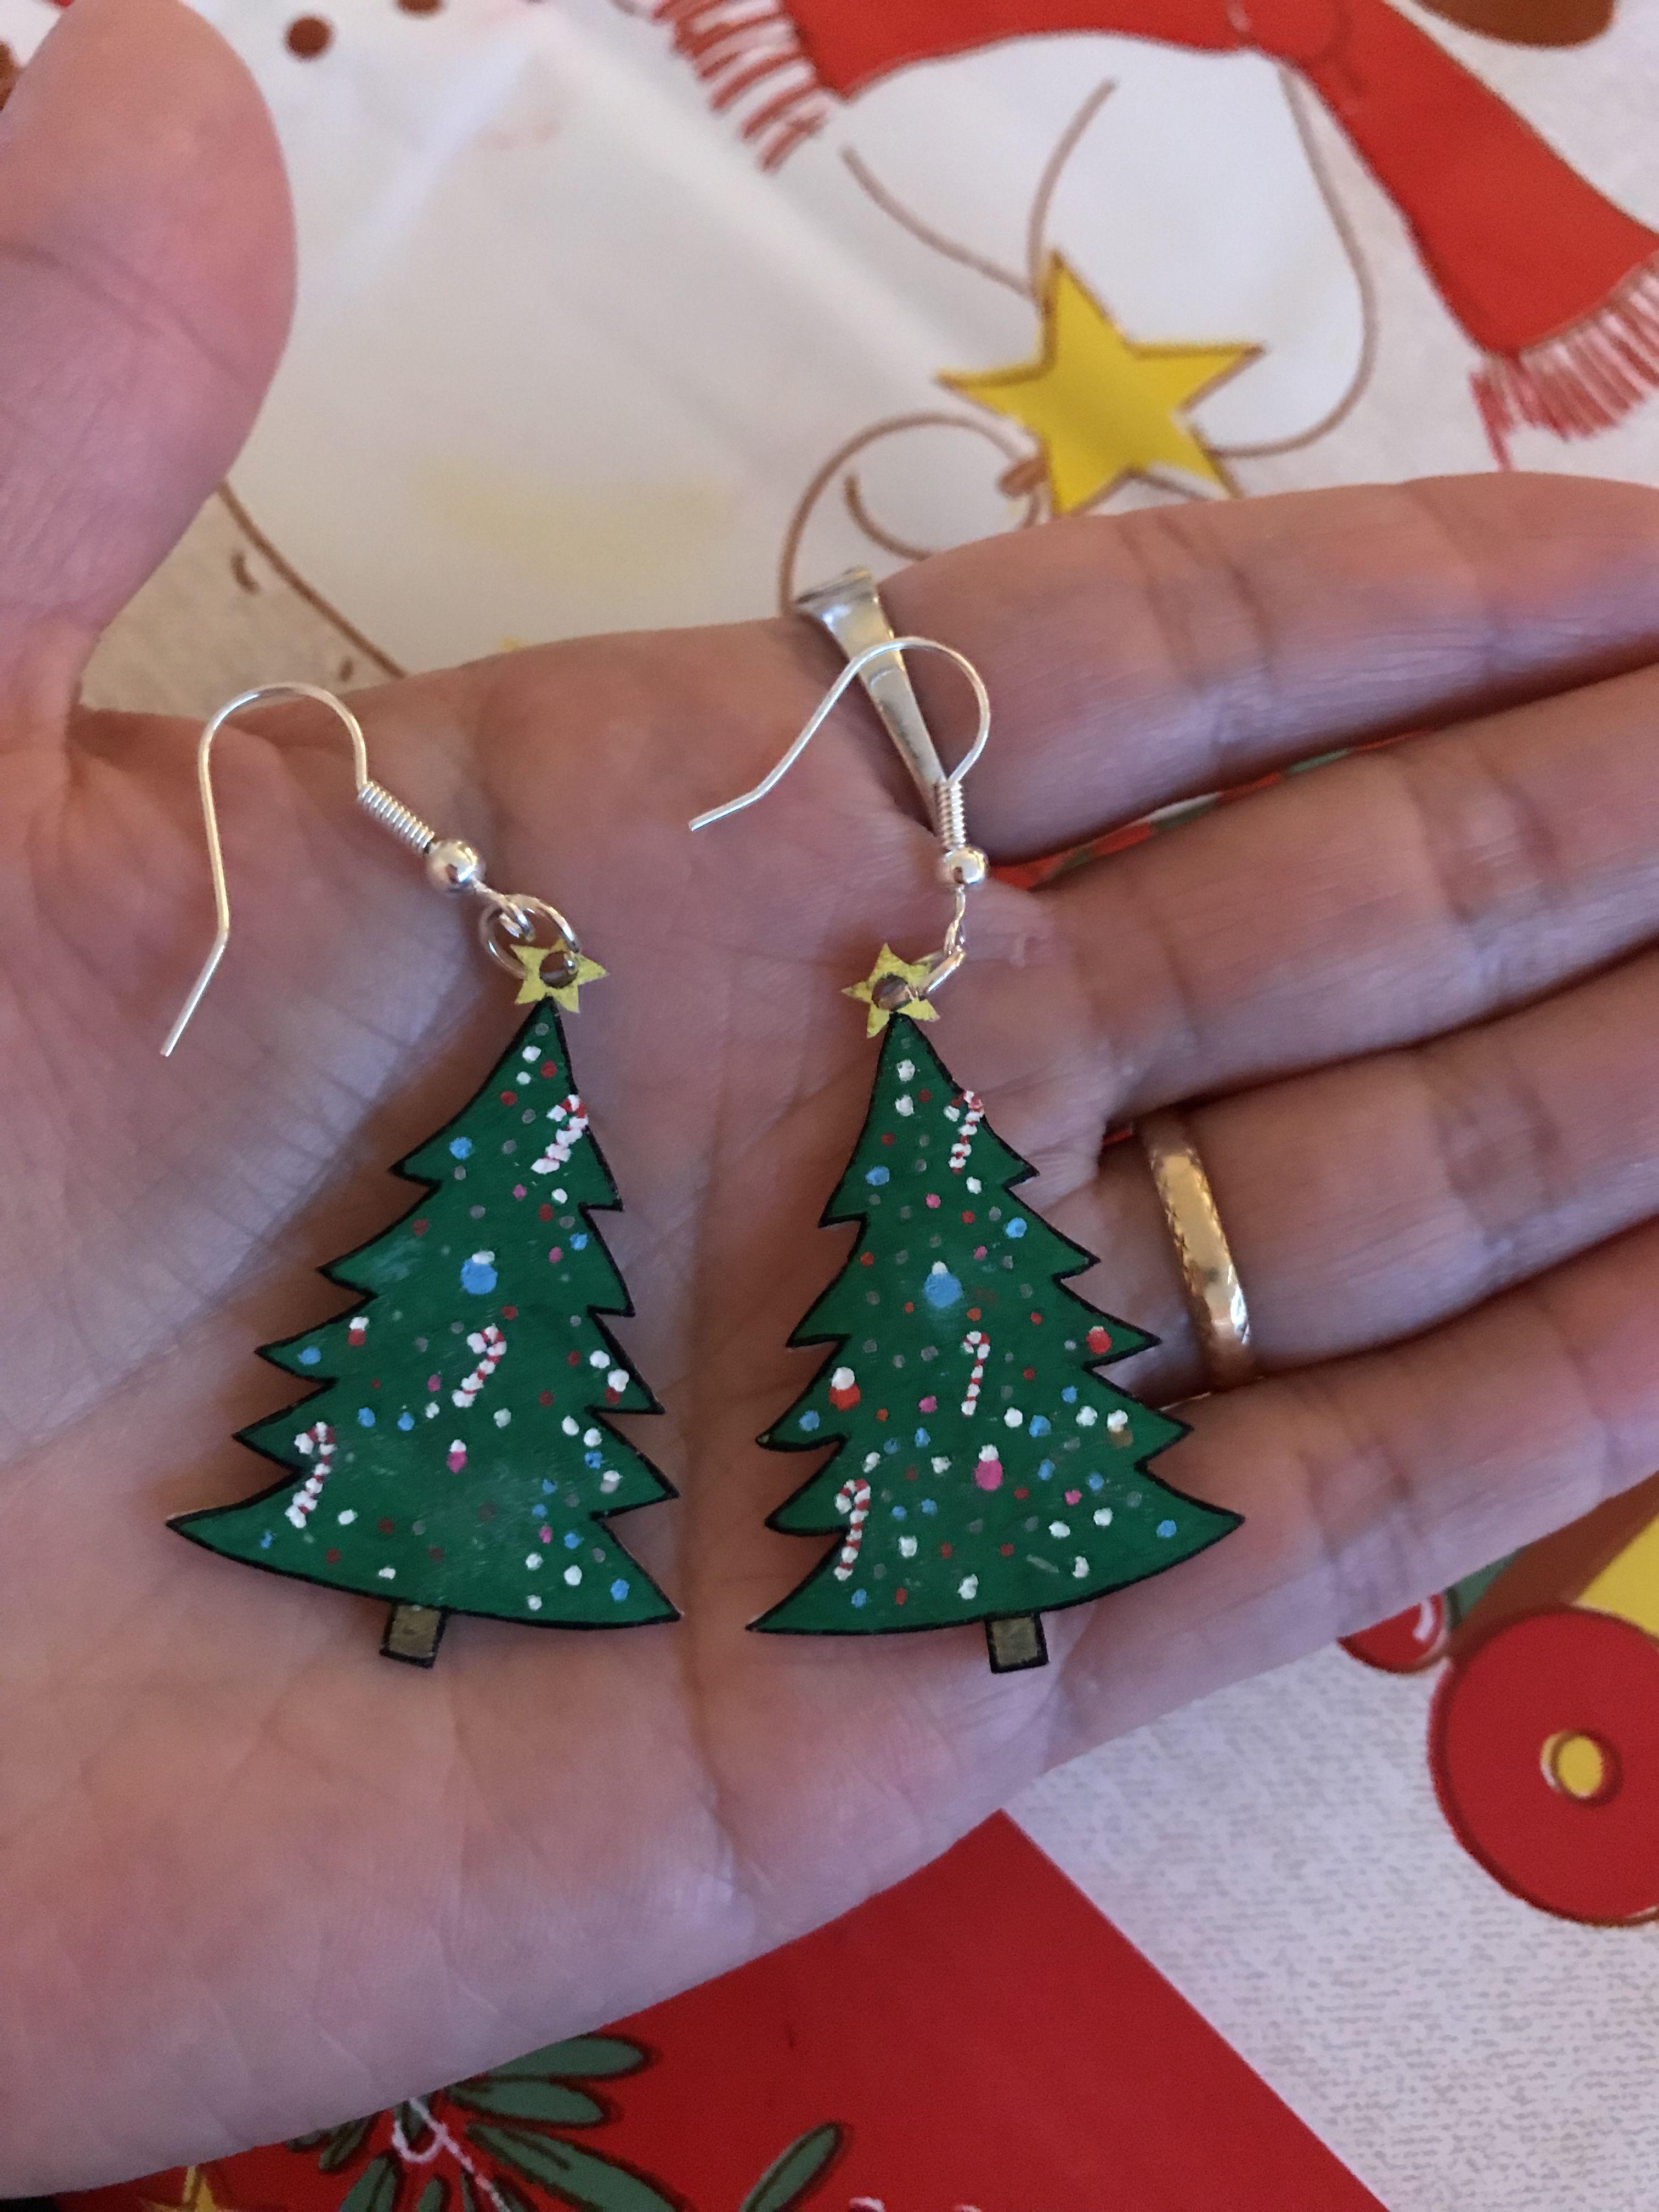 Ørering med krympeplastik juletræ torrallannikuusakka najap